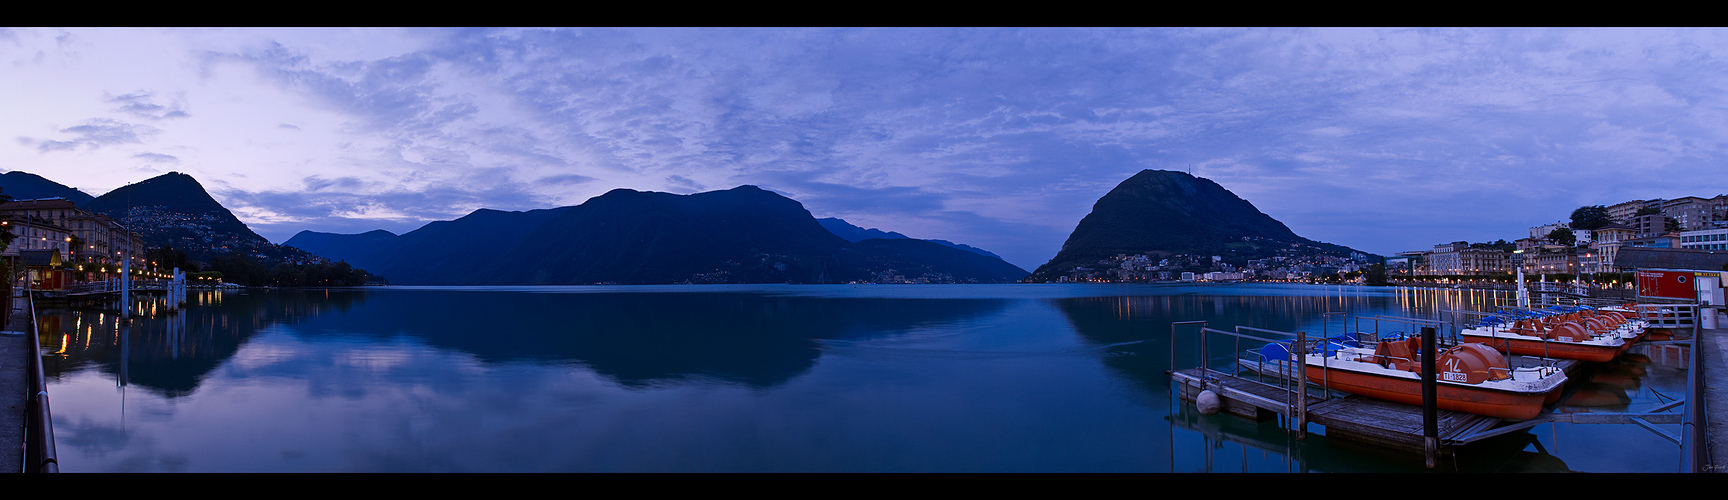 Lugano di mattina